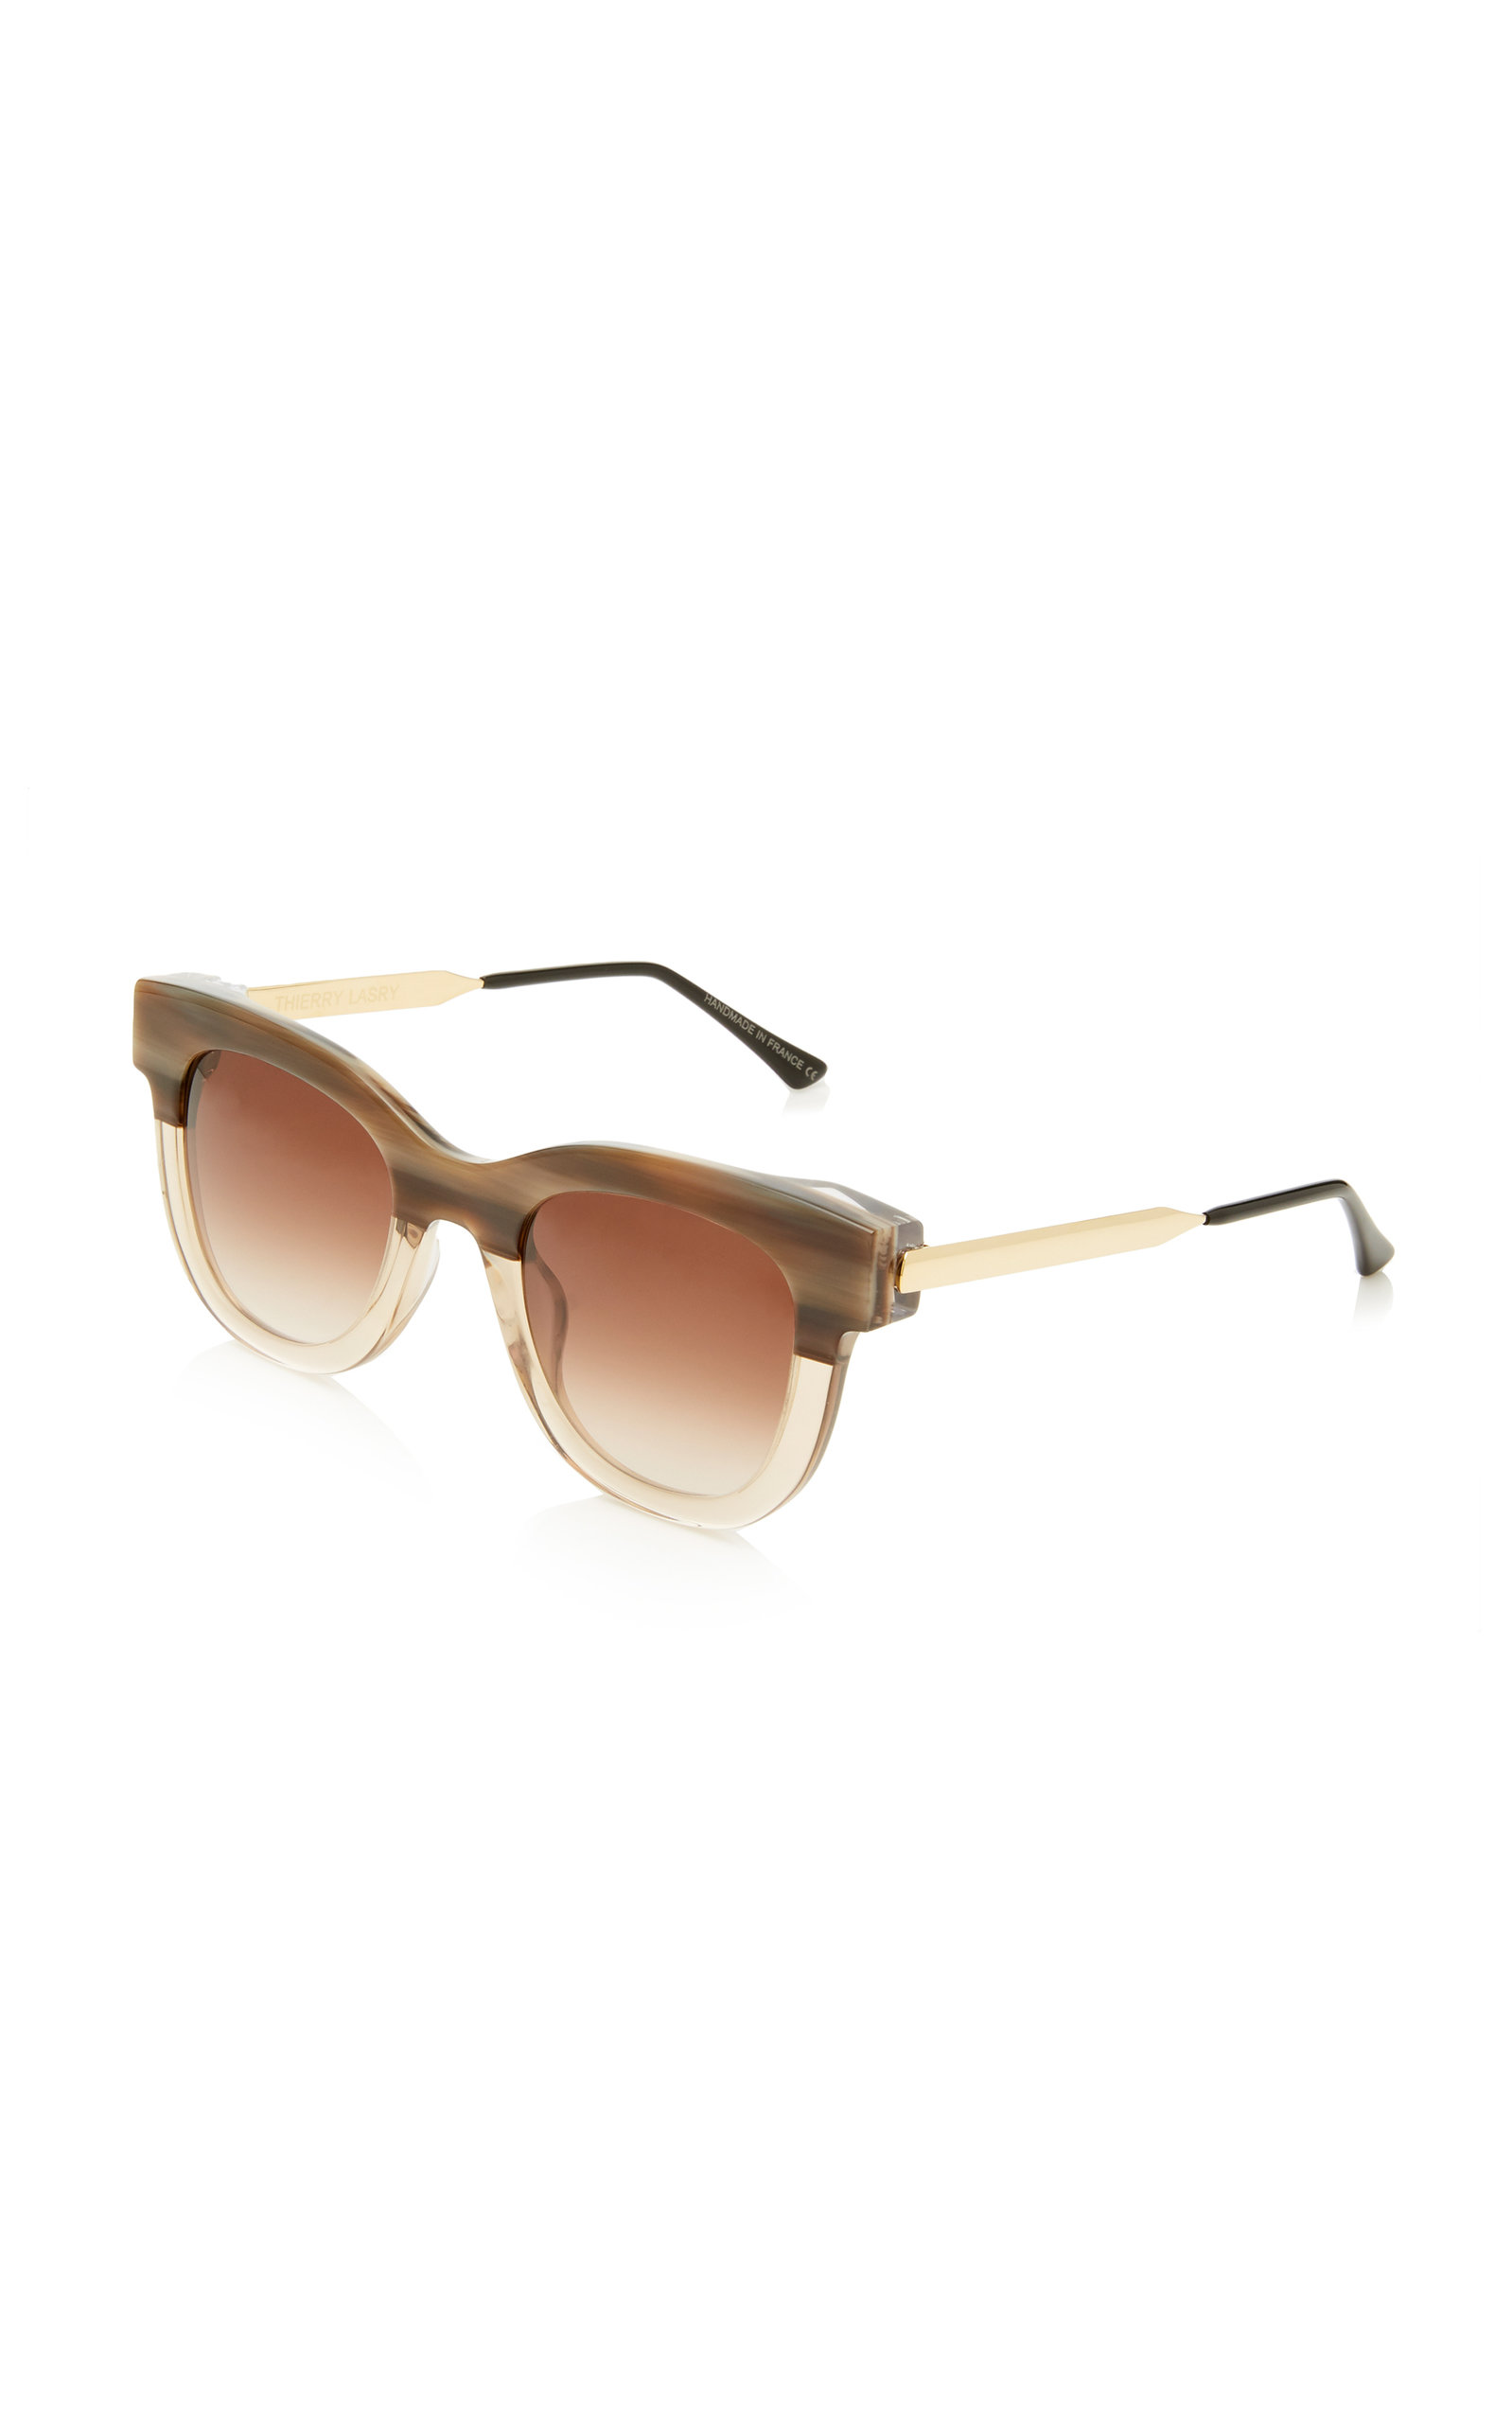 8c1e01916b Thierry LasrySEXXXY 341 Two-Tone Cat-Eye Sunglasses. CLOSE. Loading. Loading